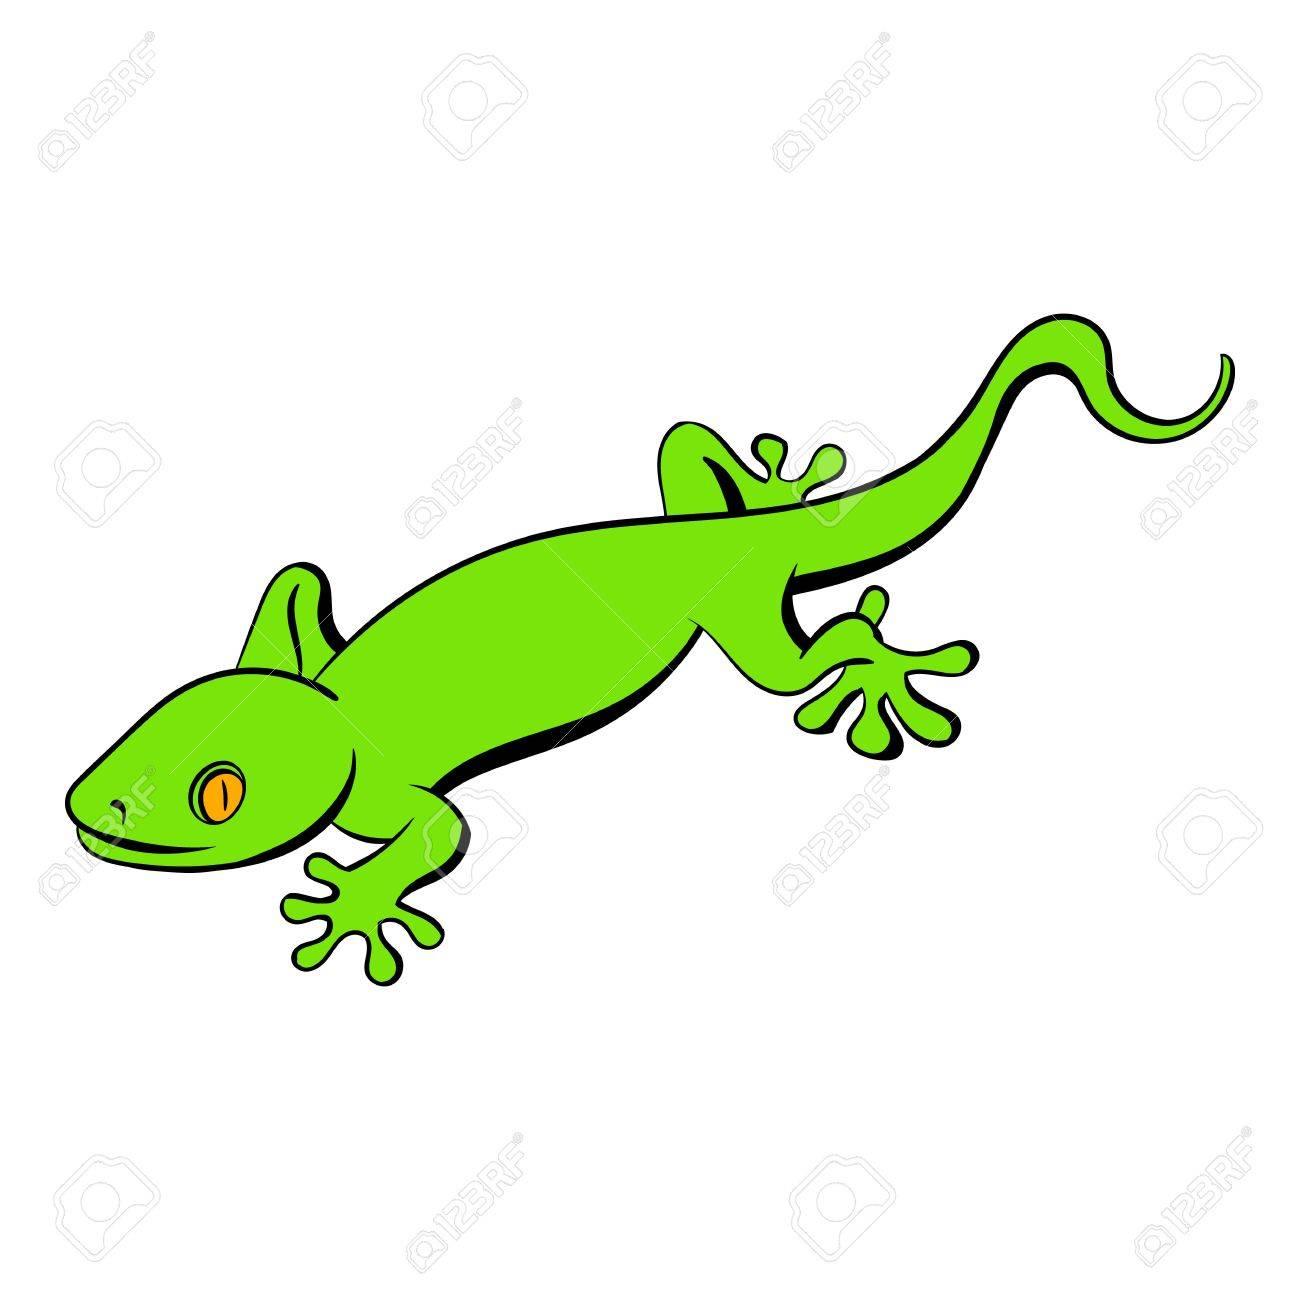 green gecko lizard icon cartoon royalty free cliparts vectors and rh 123rf com gekko cartoon pj masks gecko cartoon images